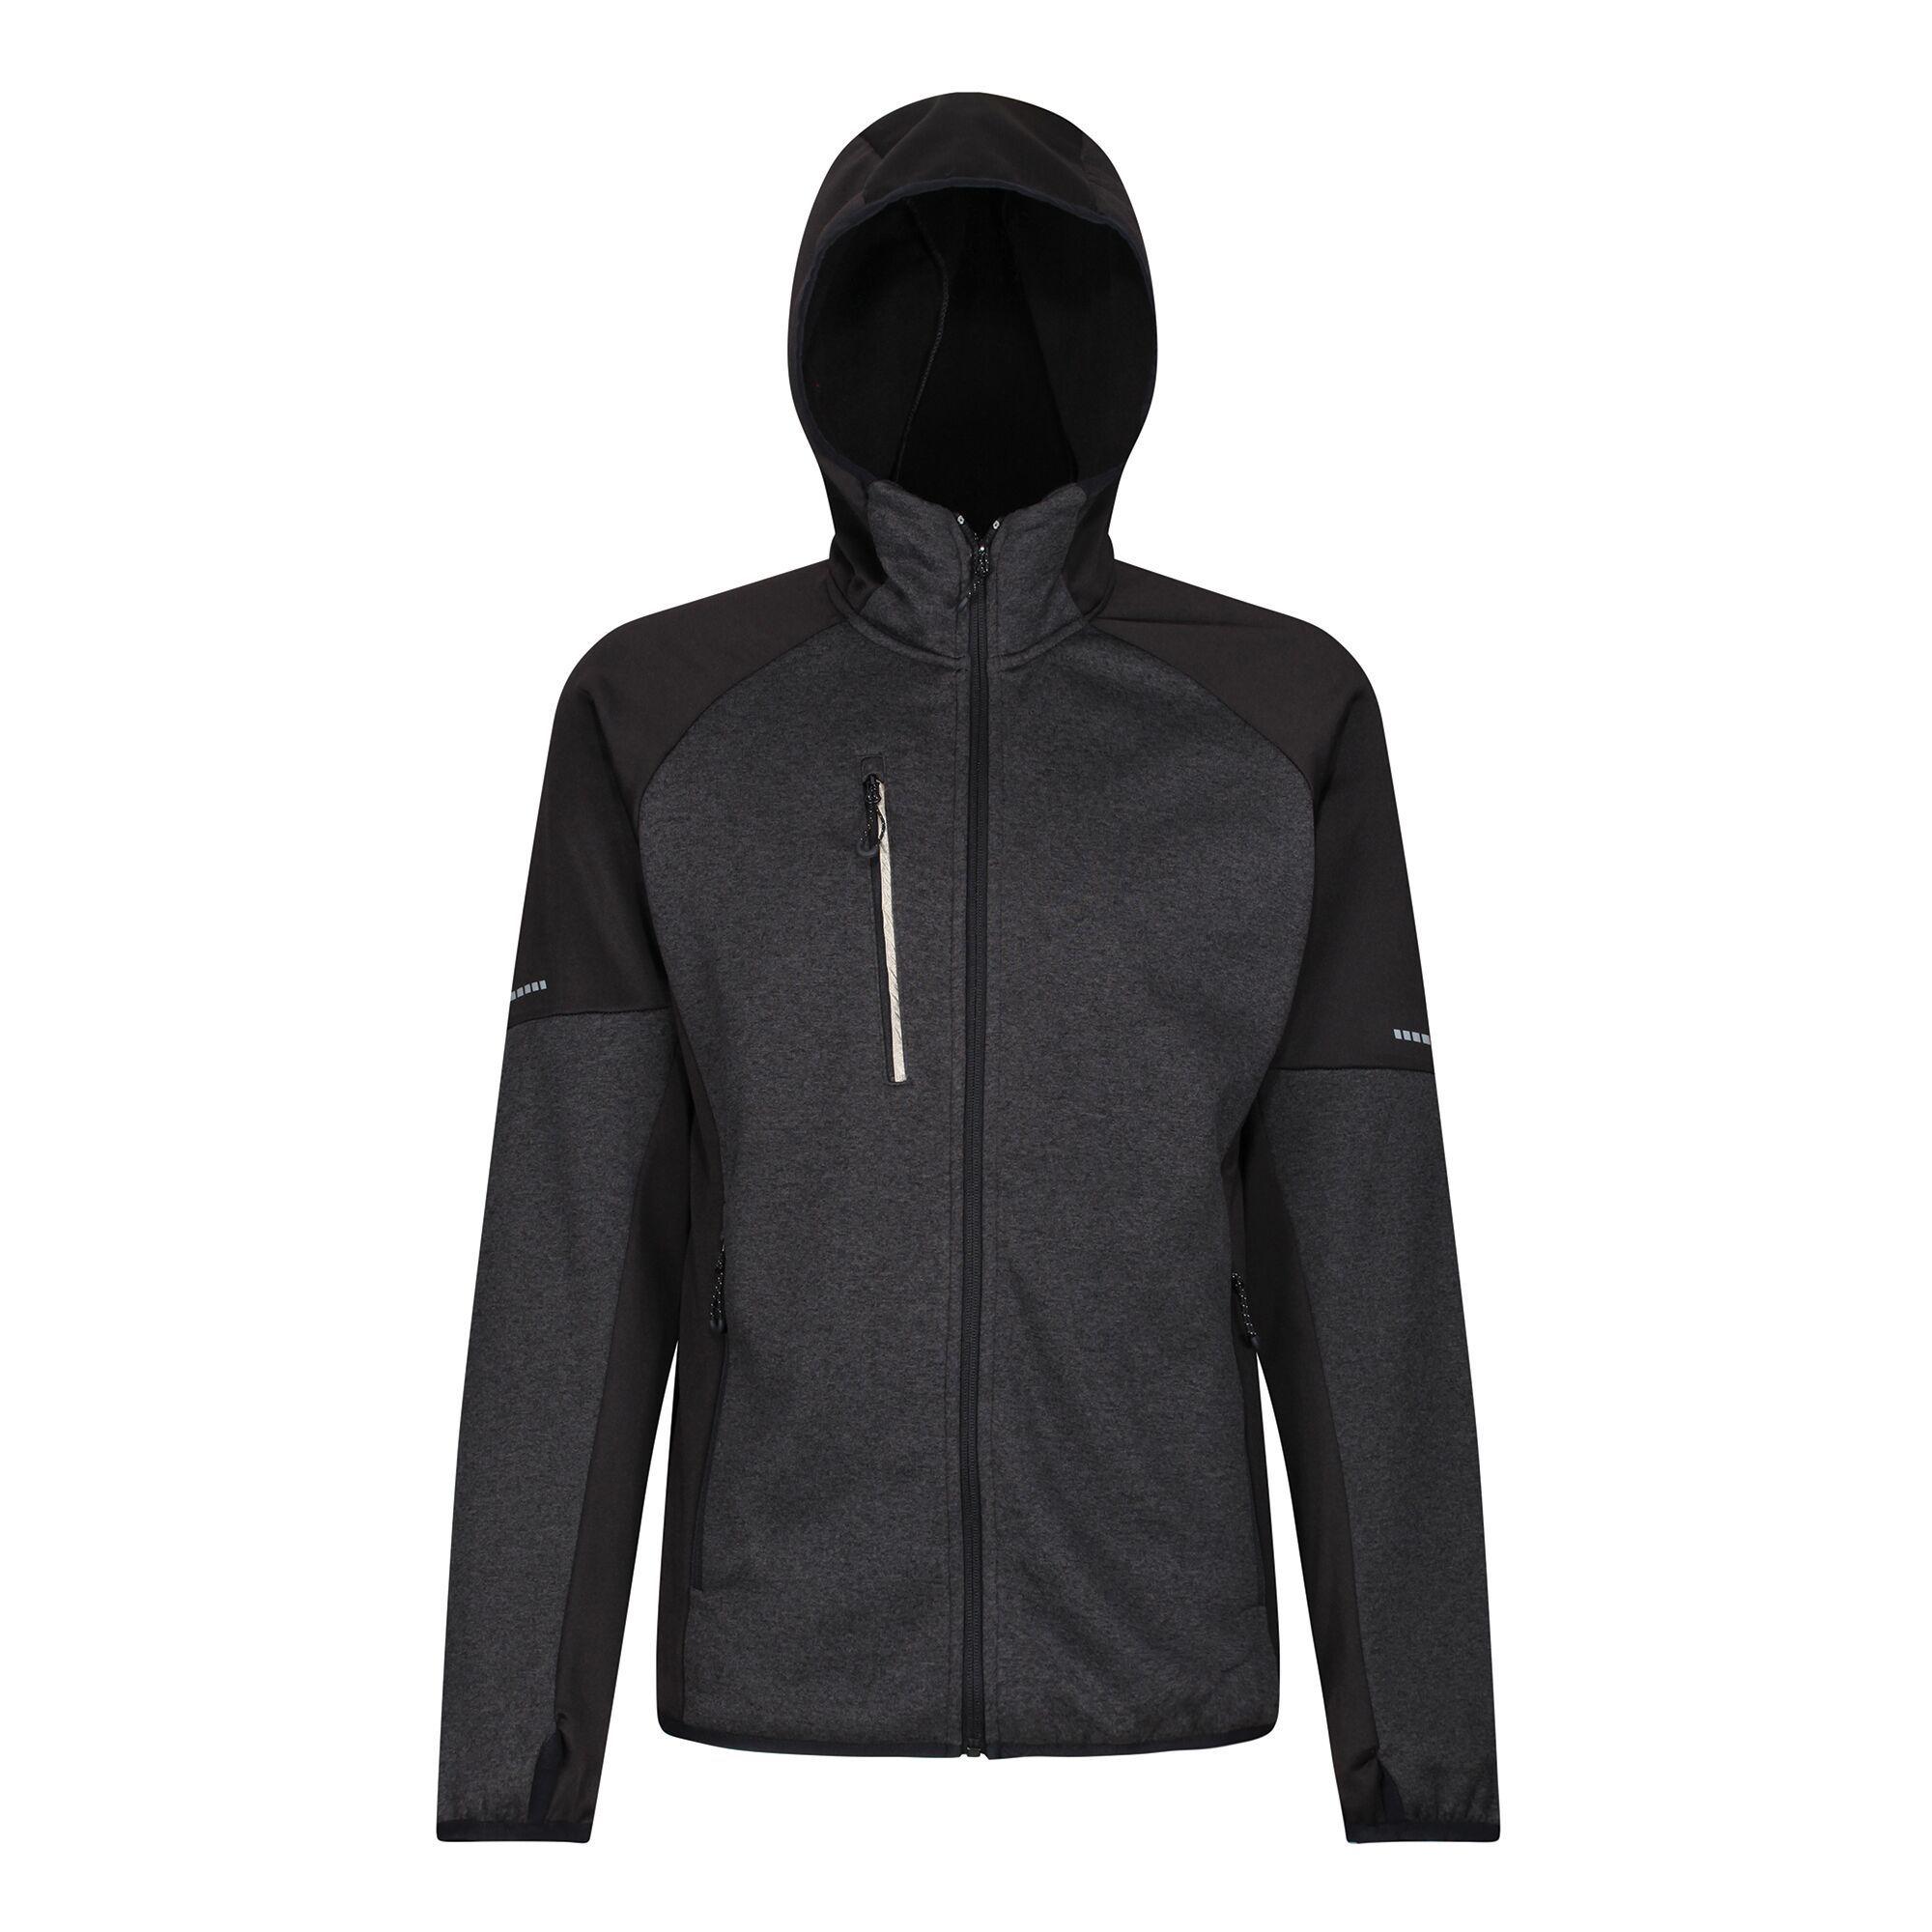 Regatta Mens X-Pro Coldspring II Fleece Jacket (3XL) (Black/Grey Marl)